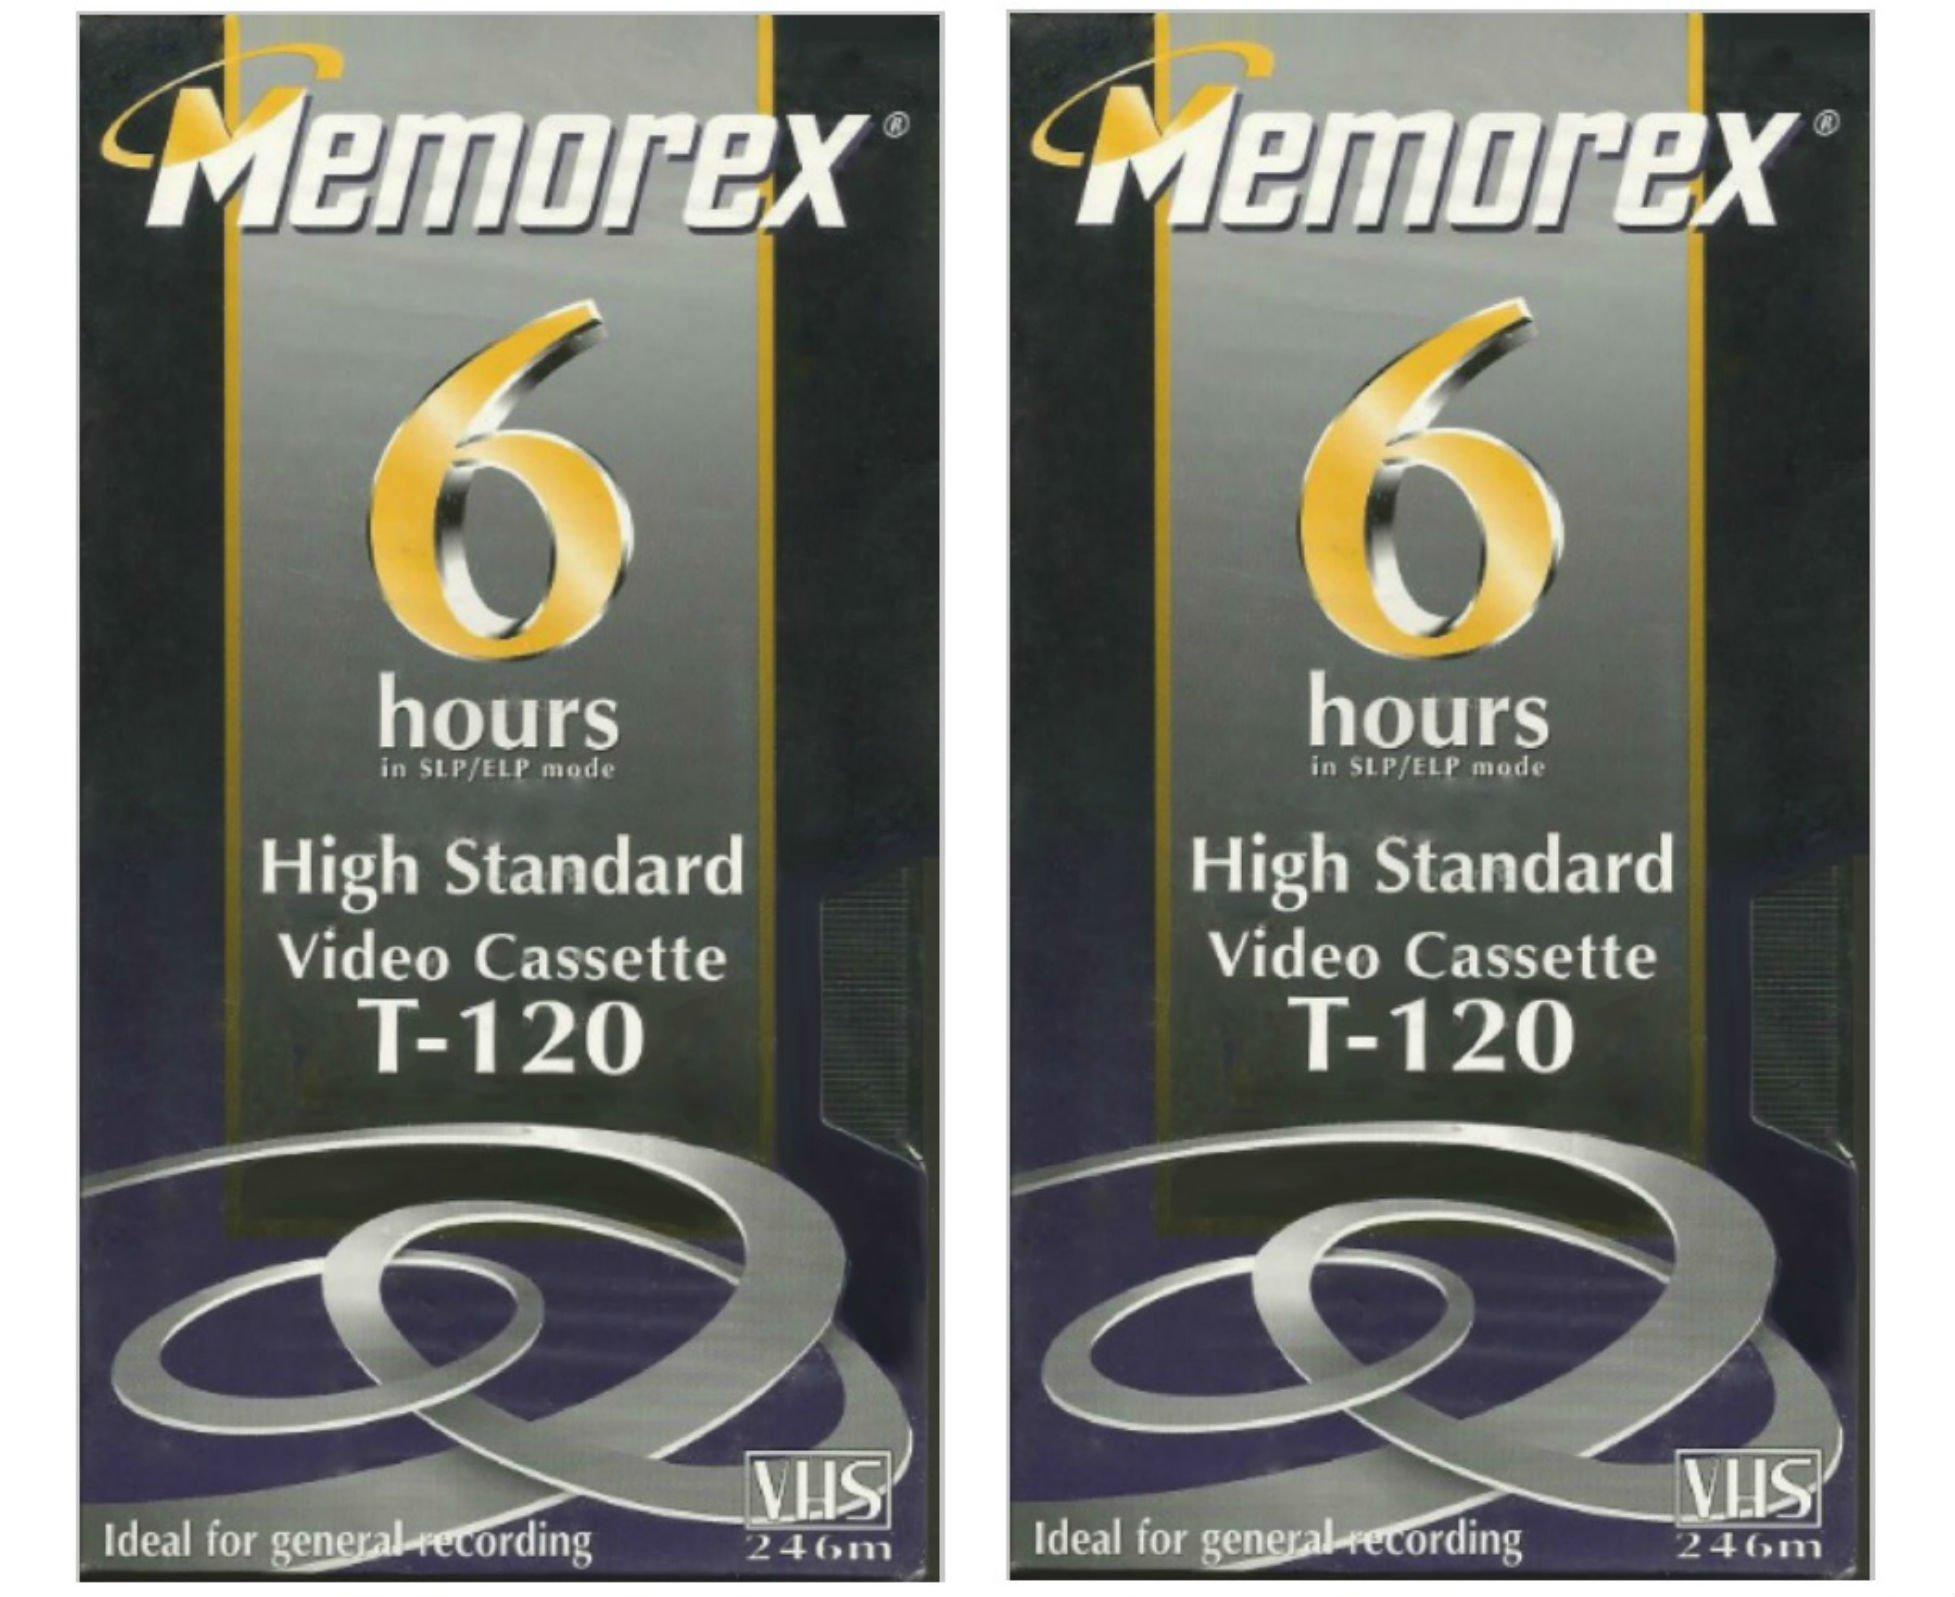 ghdonat.com Blank Video Media Accessories 6 hours in EP Mode Kodak ...